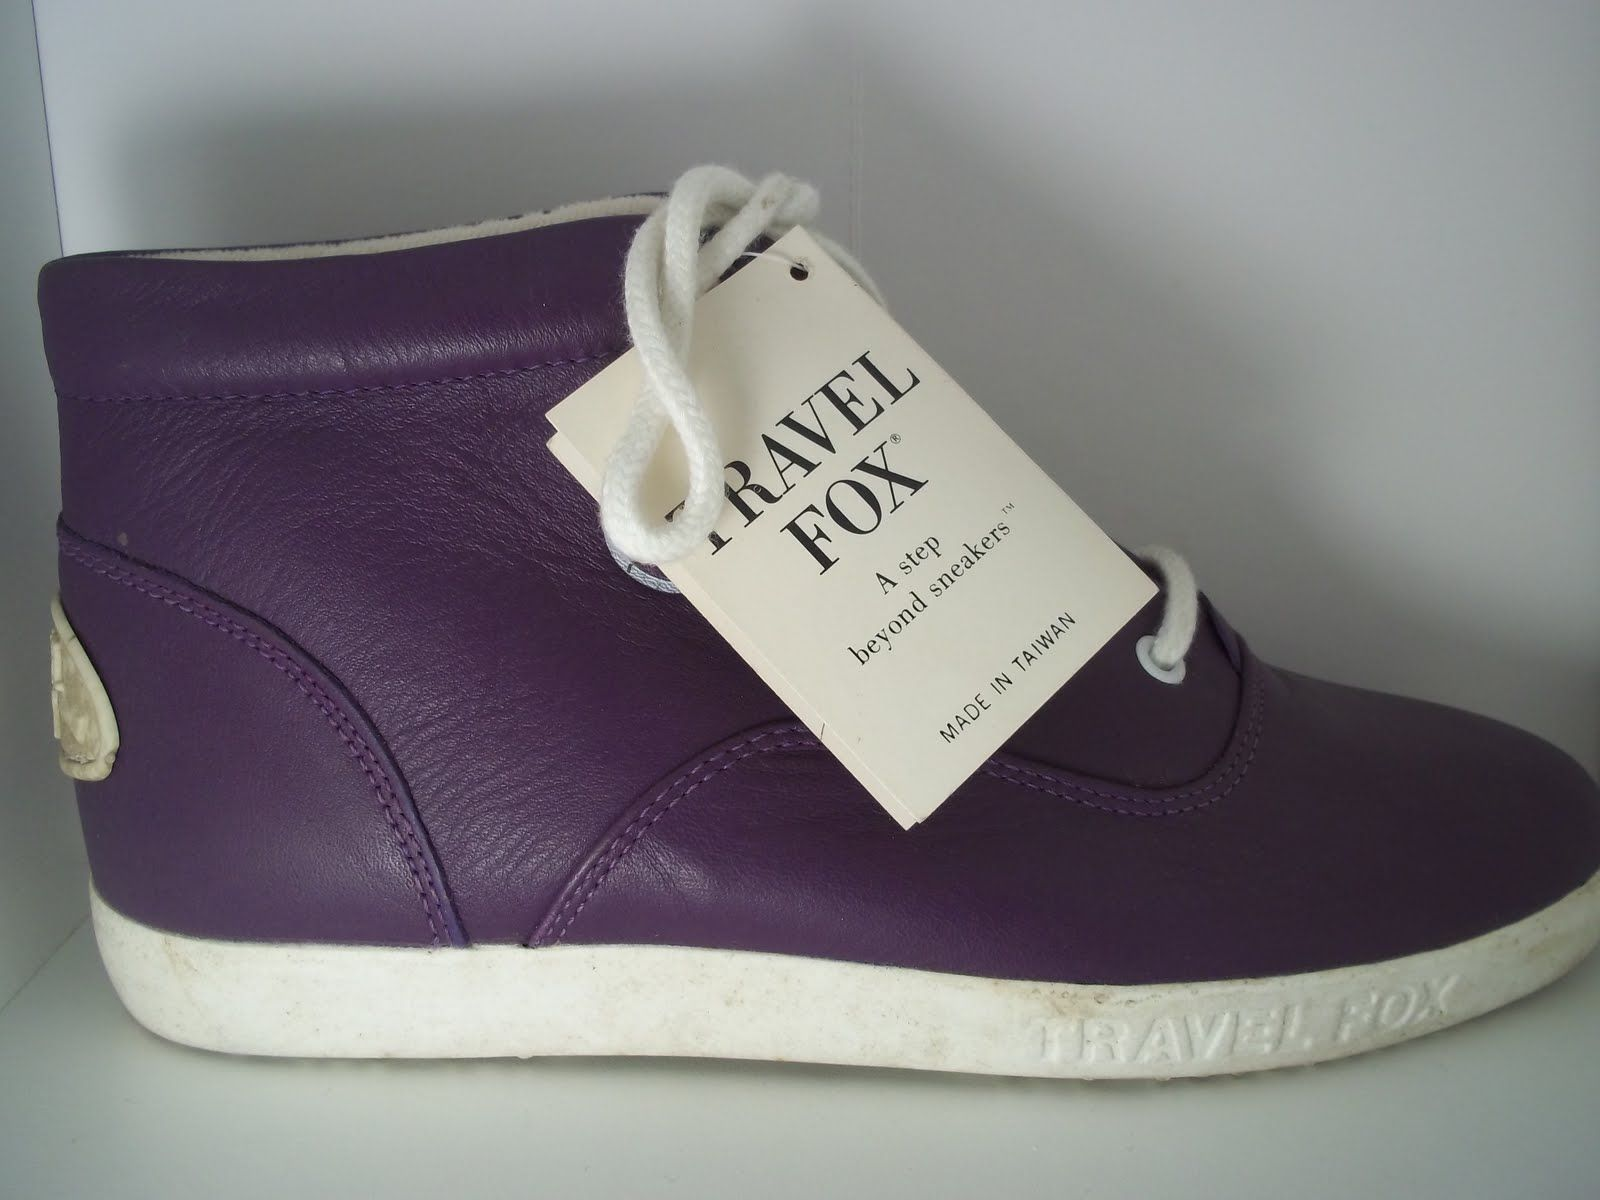 f2a59823bca travel fox sneakers